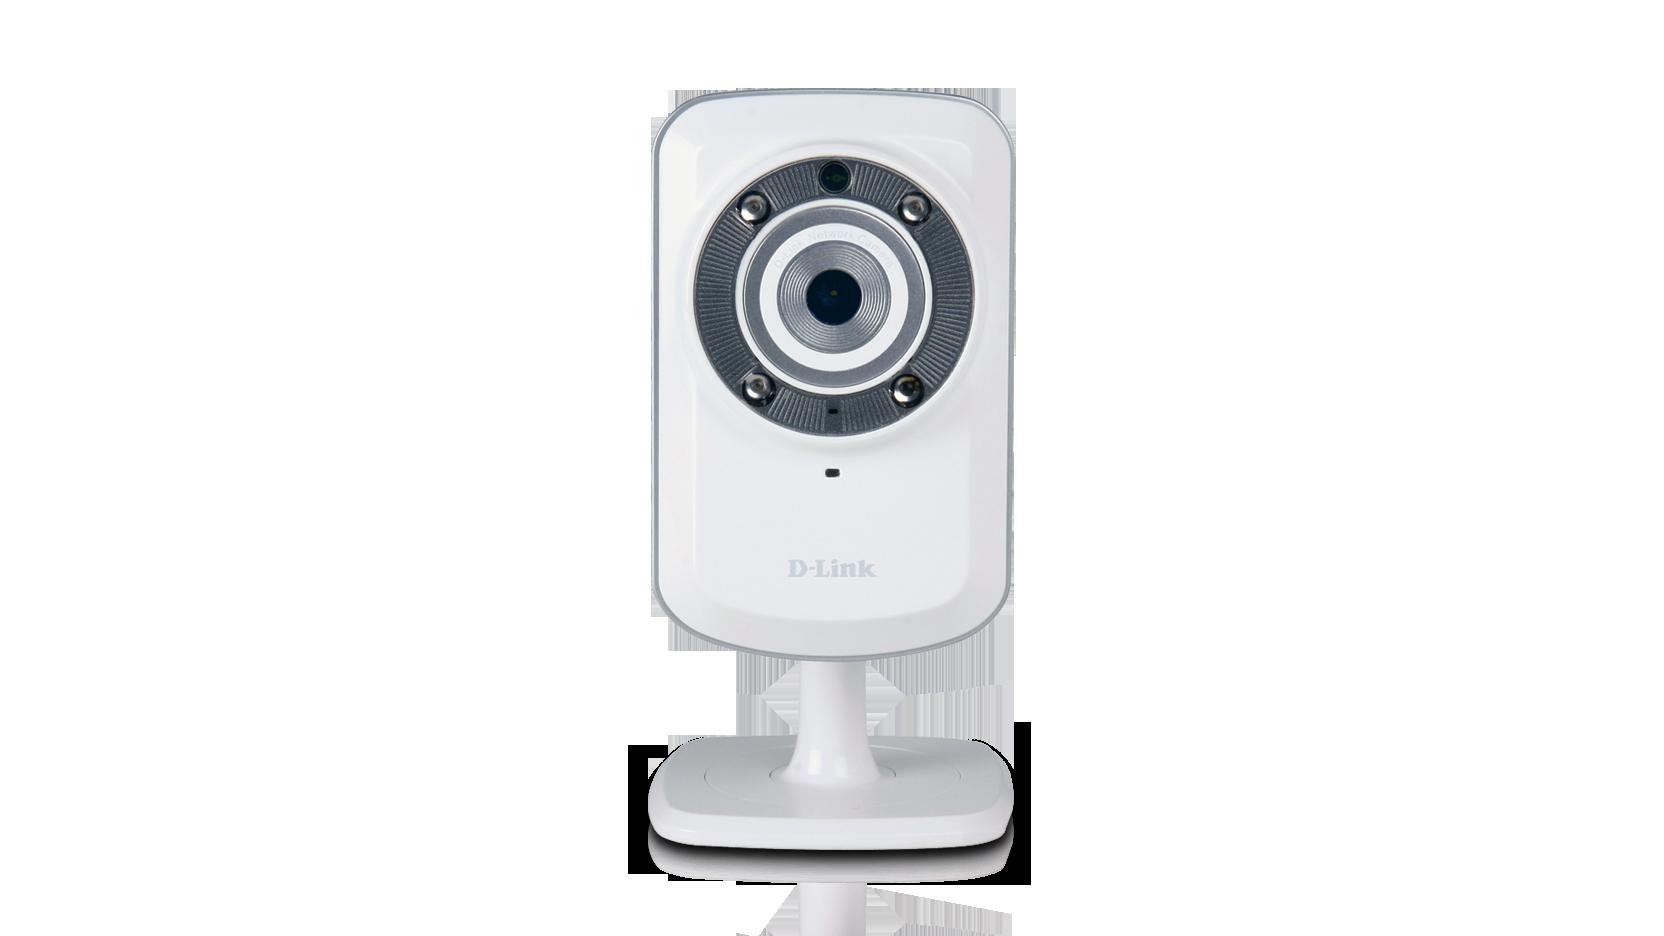 Biztonságtechnika D-Link DCS-932L Wireless N Day/Night Home Network Camera